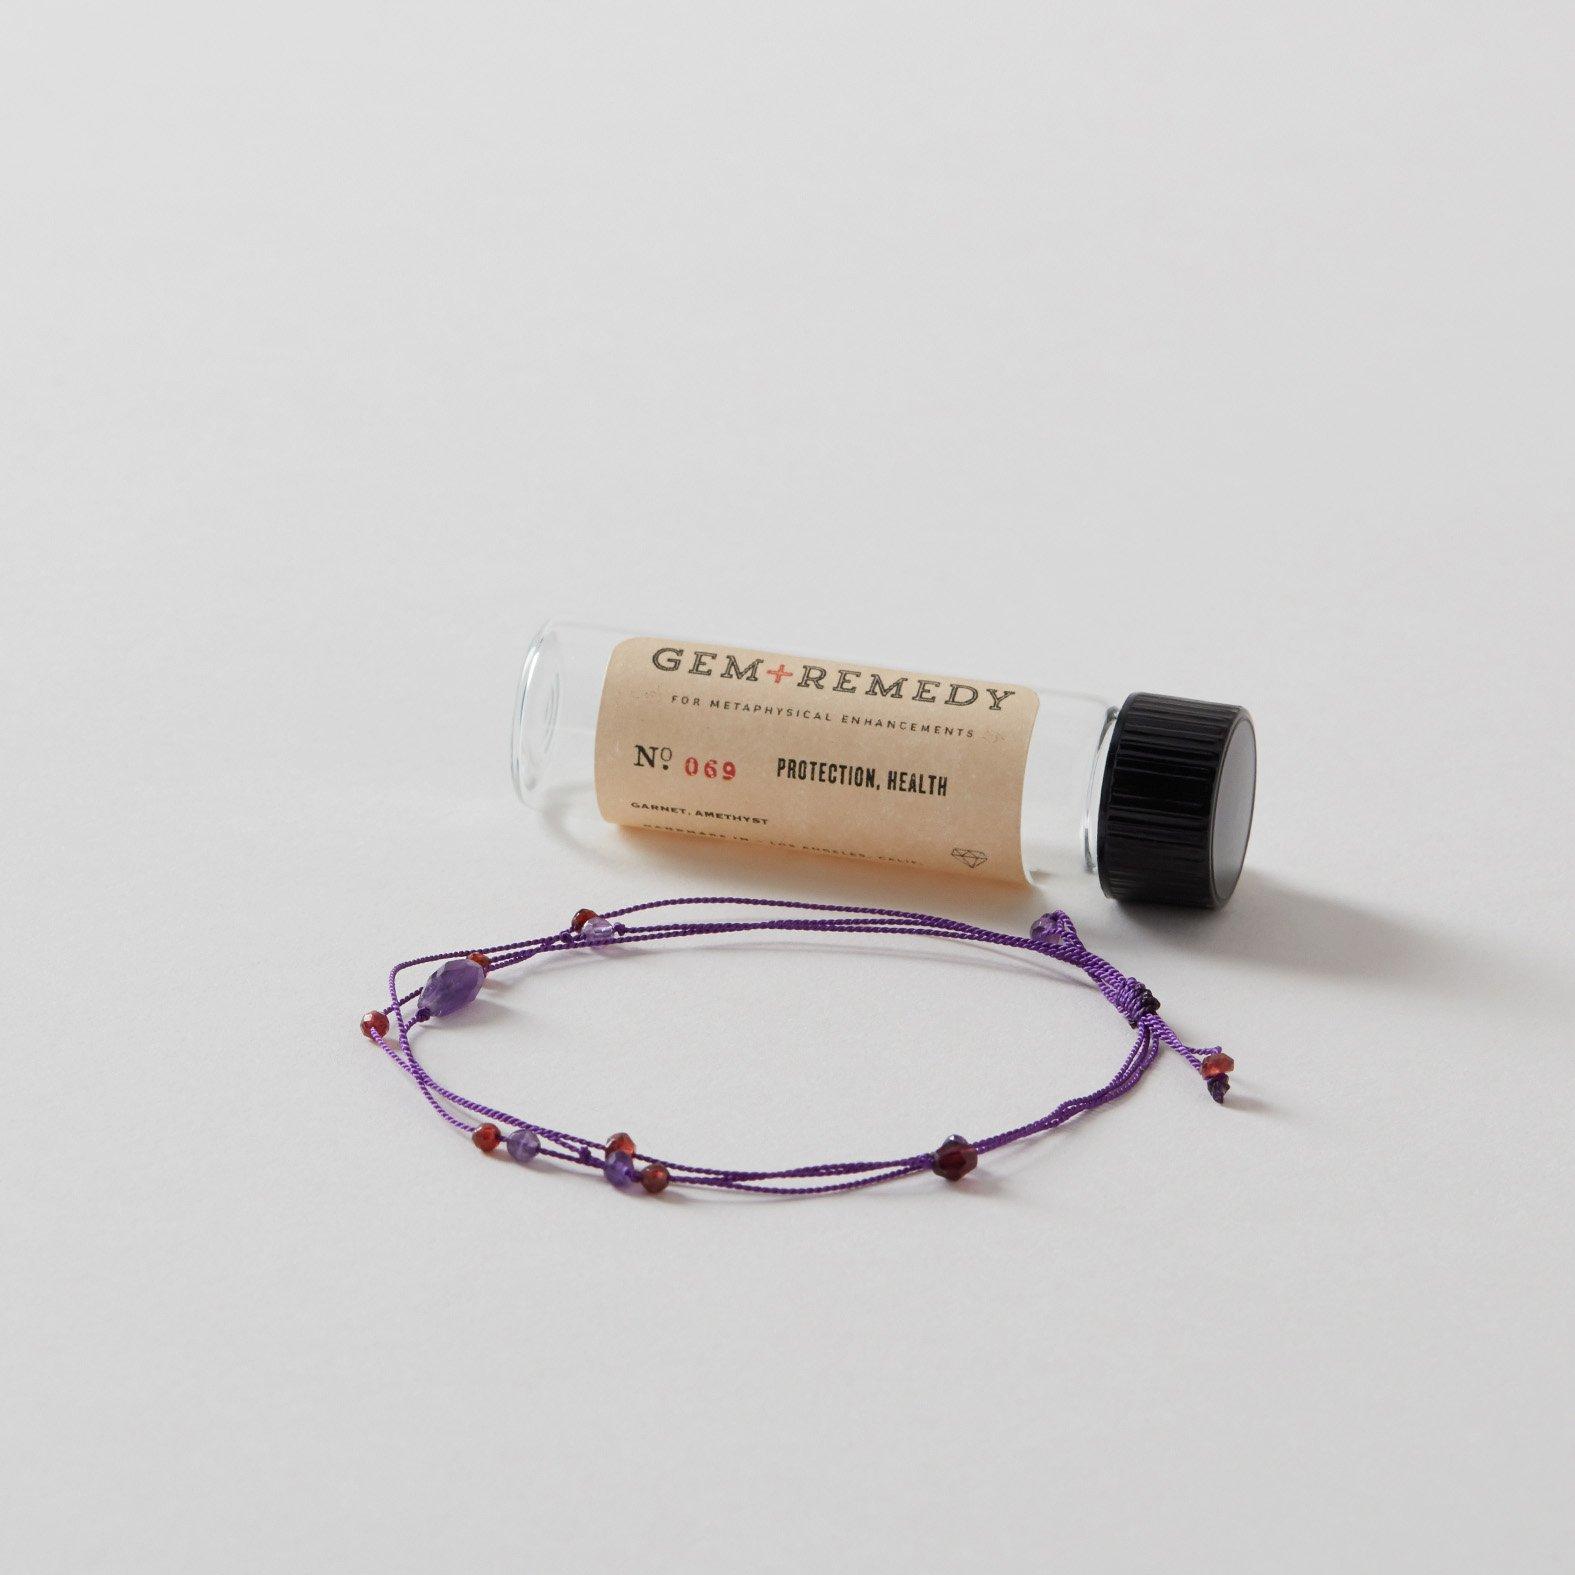 Gem Remedy Health + Protection Bracelet